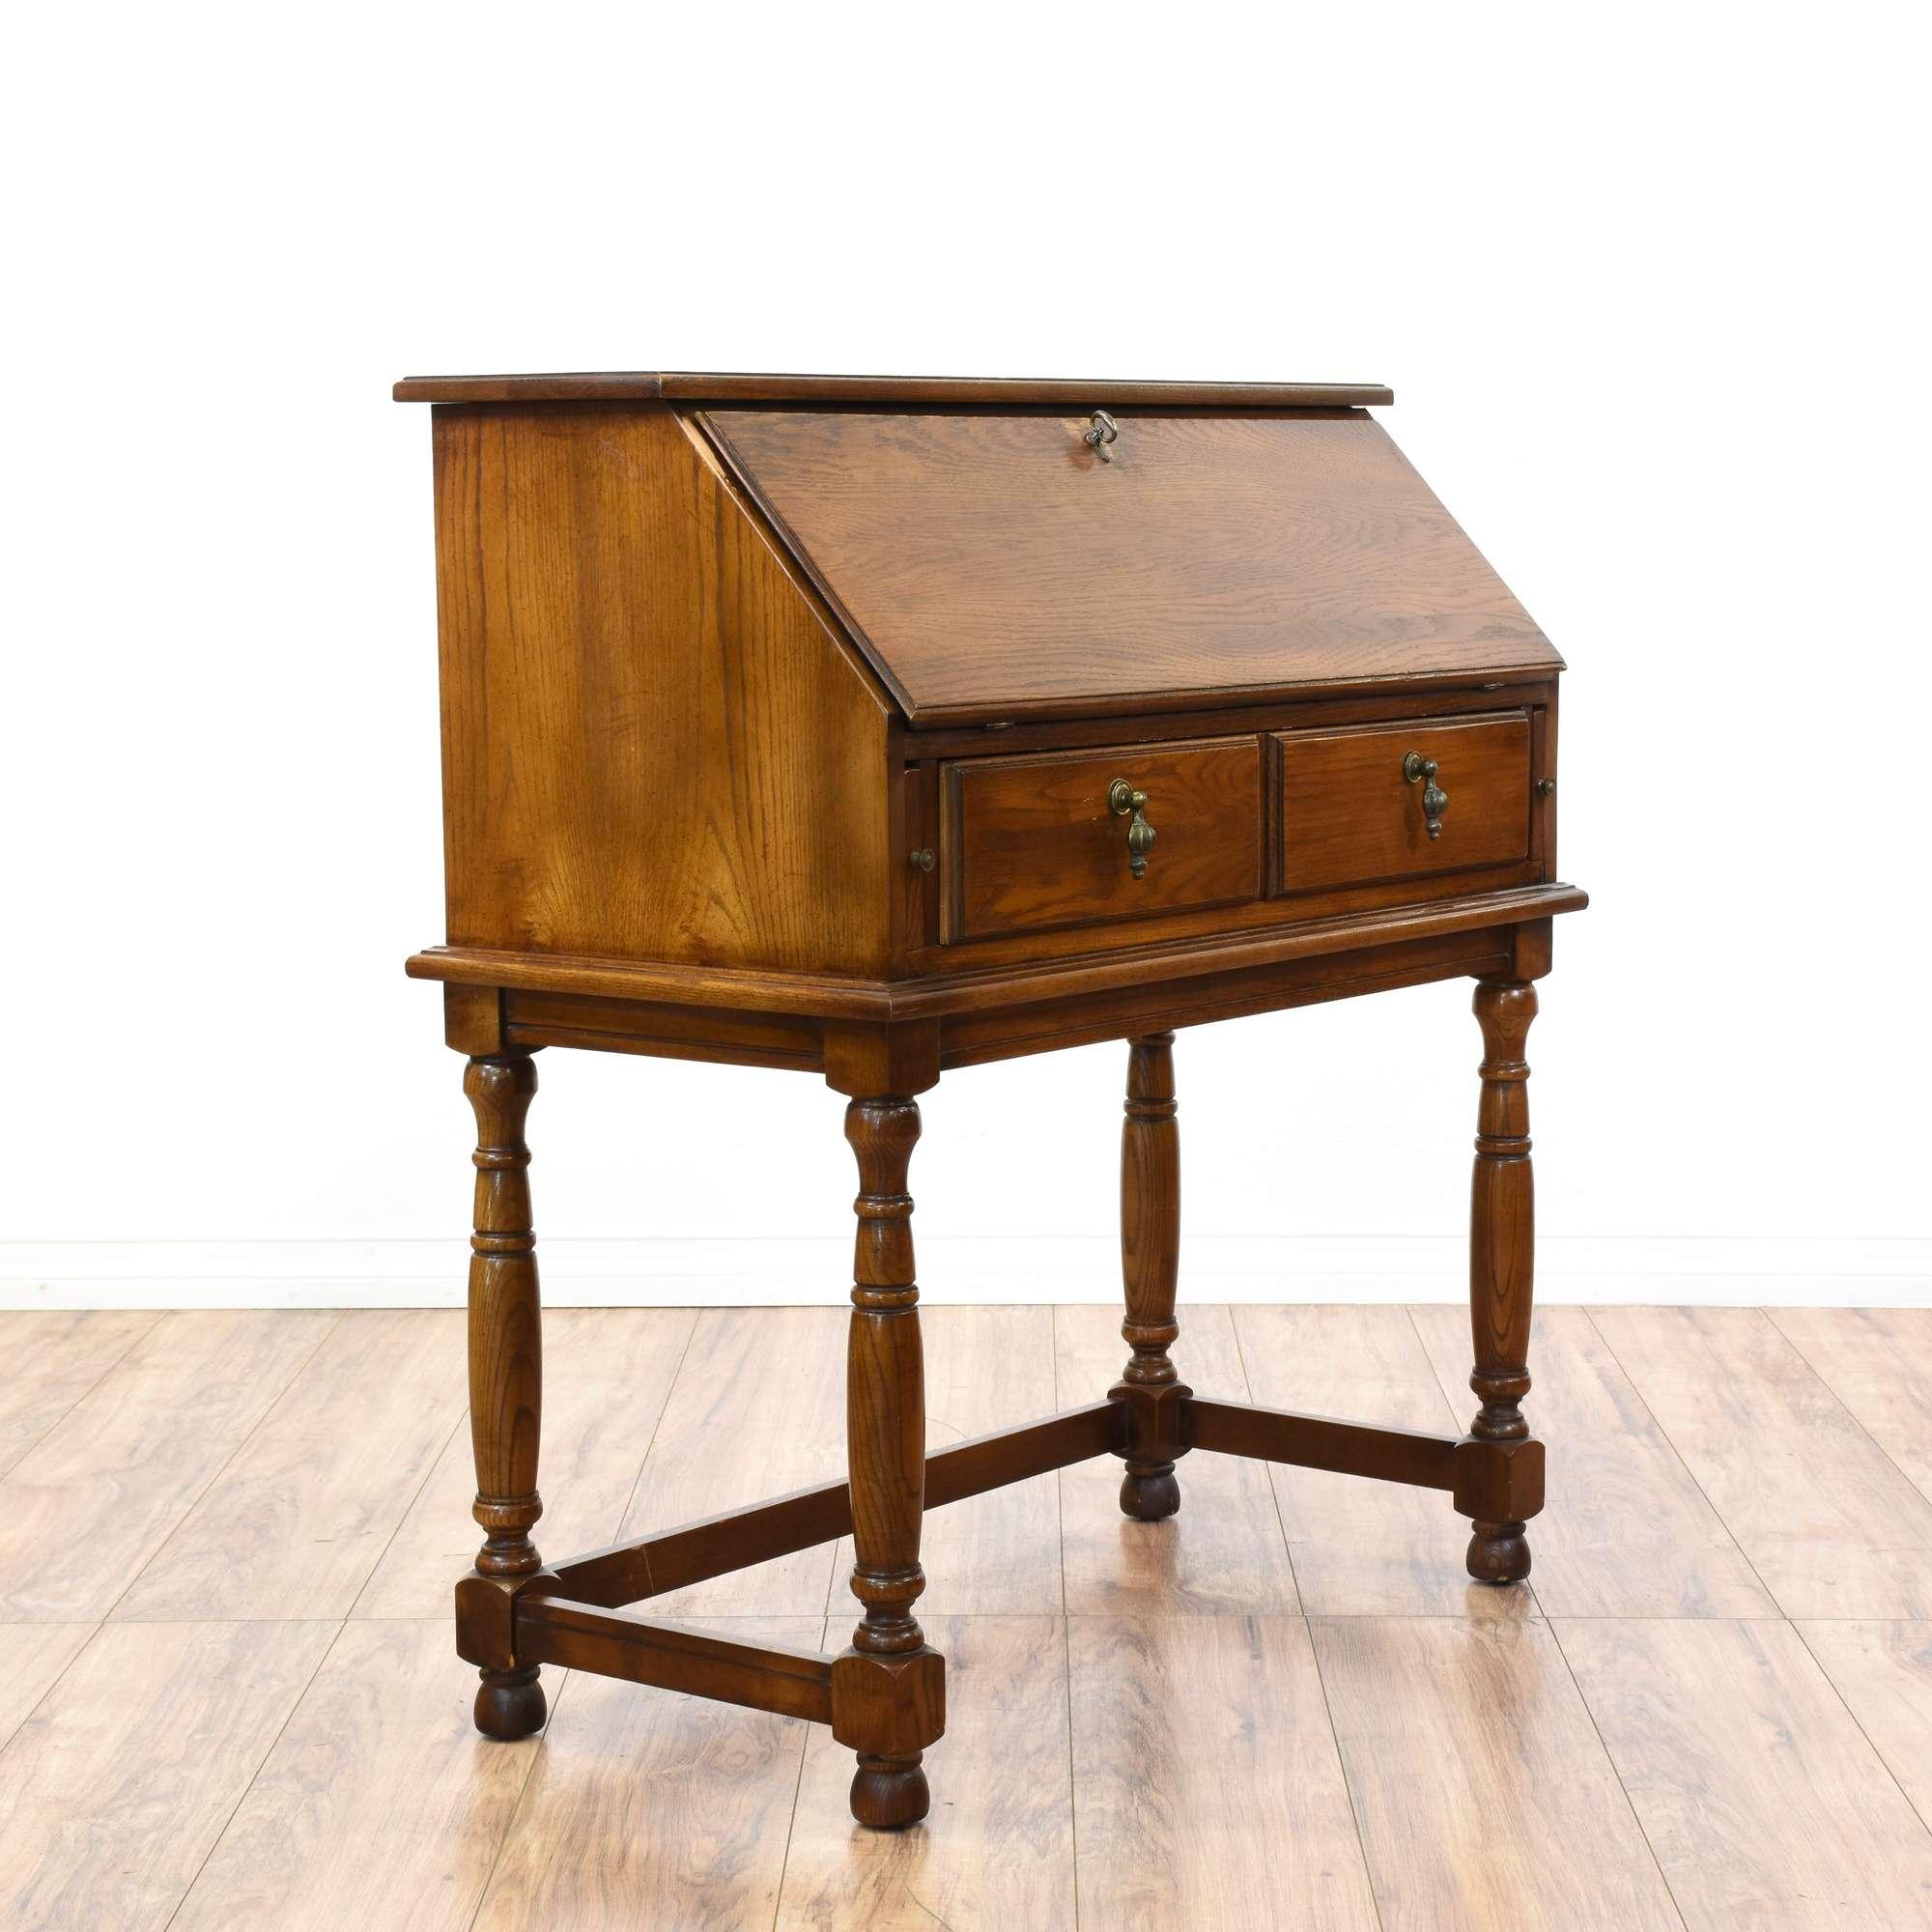 design egon teak items ostergaard sold by home desk danish pin furniture secretary modern